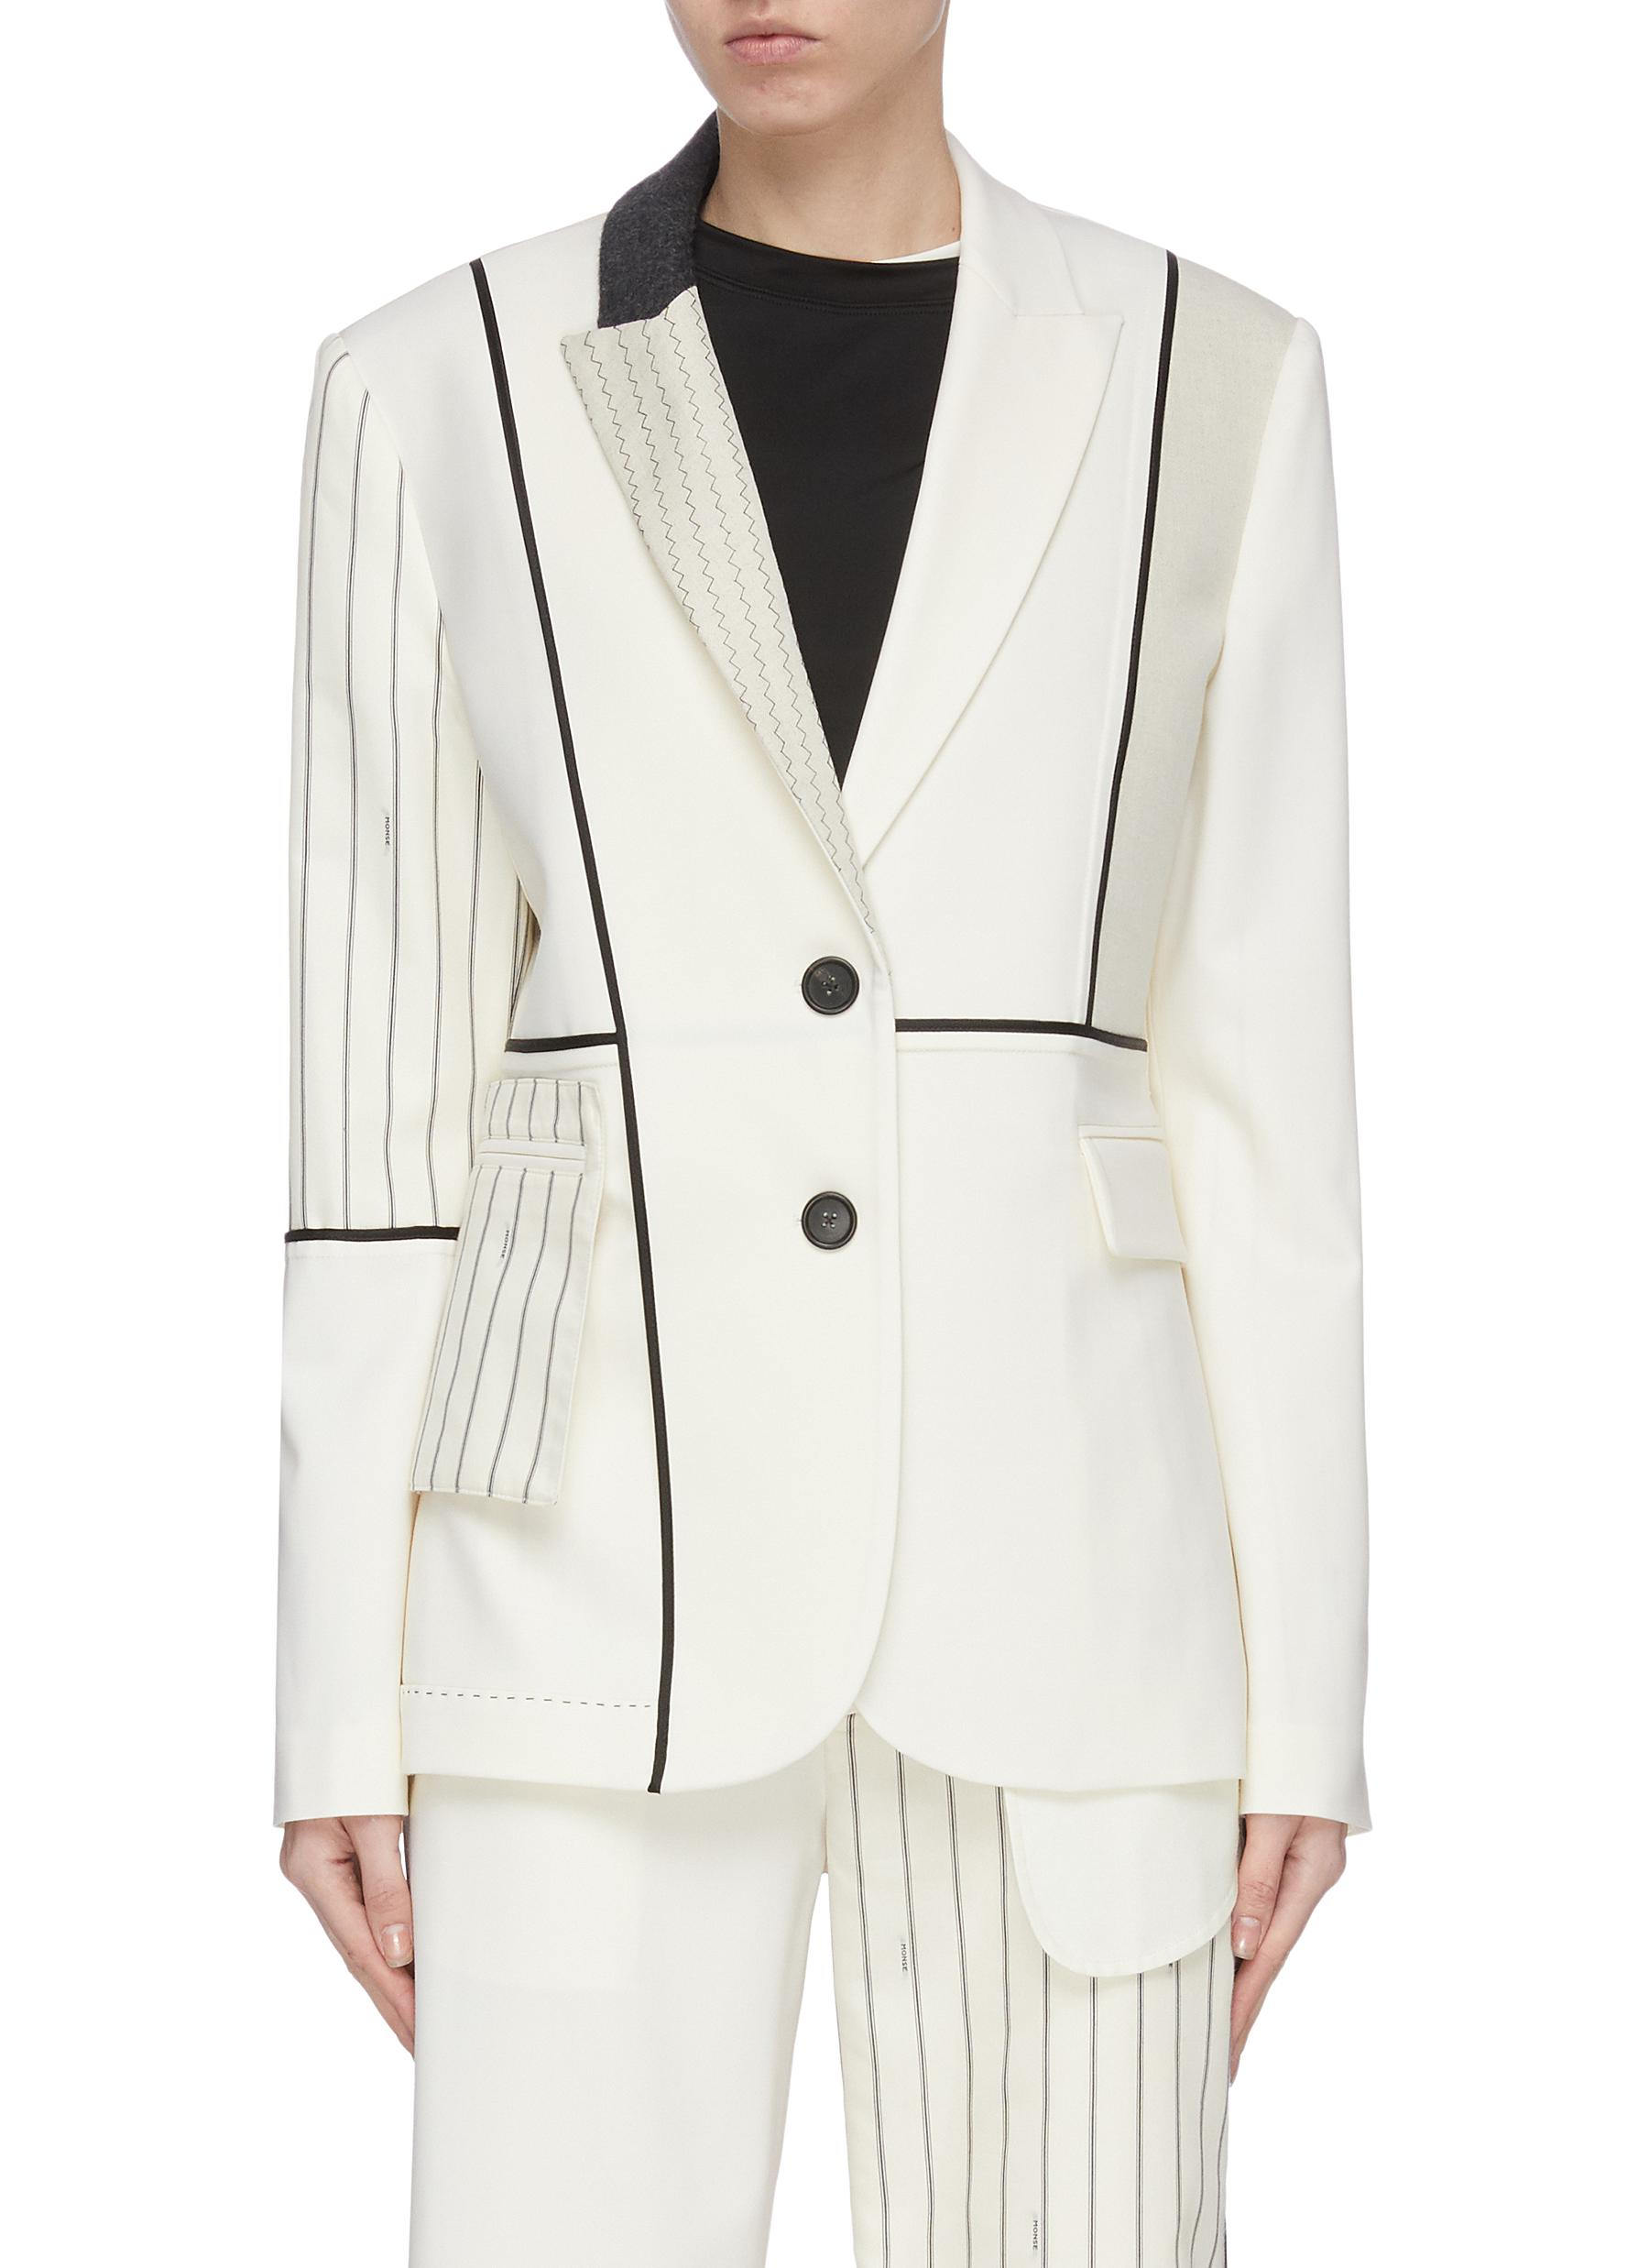 Buy Monse Blazers 'Inside Out' patchwork blazer